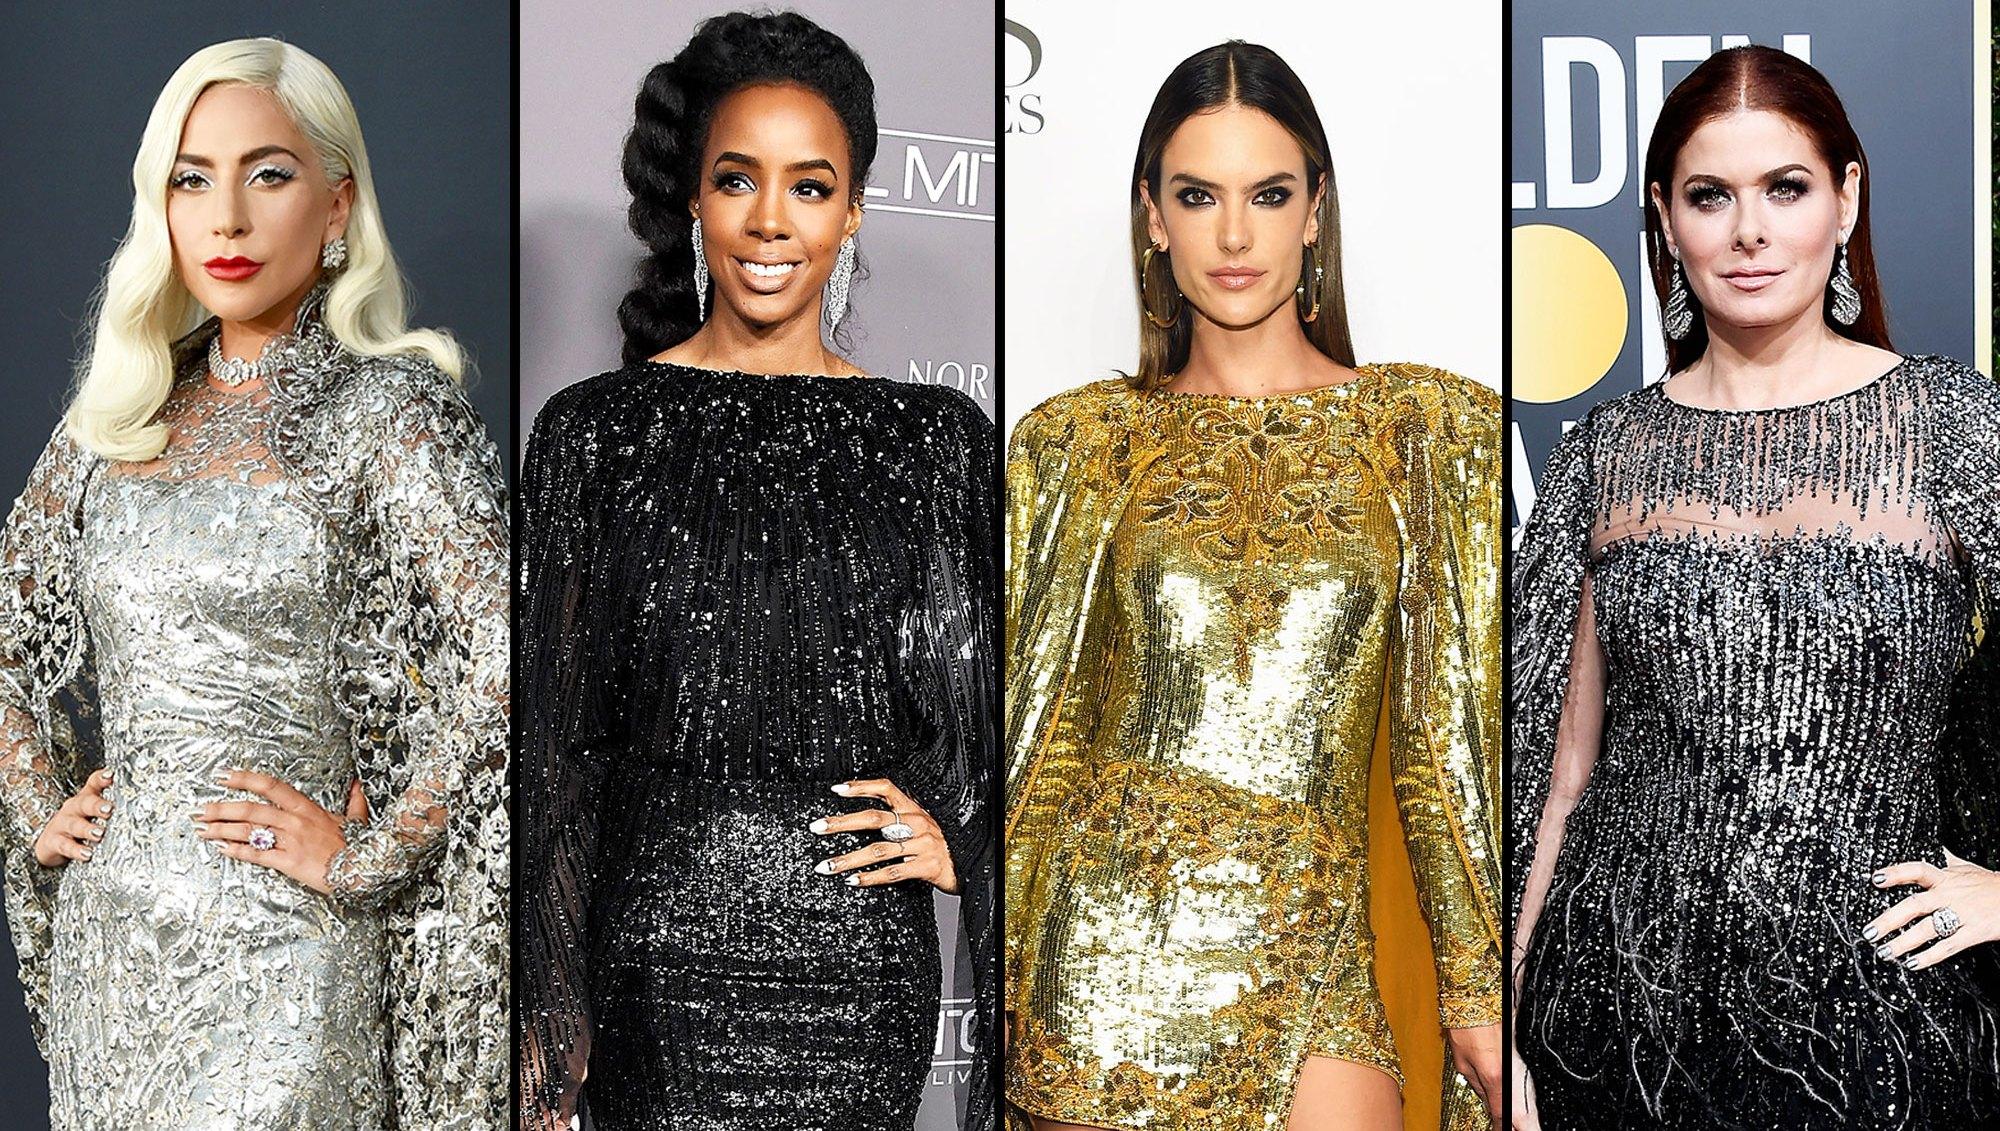 Lady Gaga, Kelly Rowland, Alessandra Ambrosio and Debra Messing